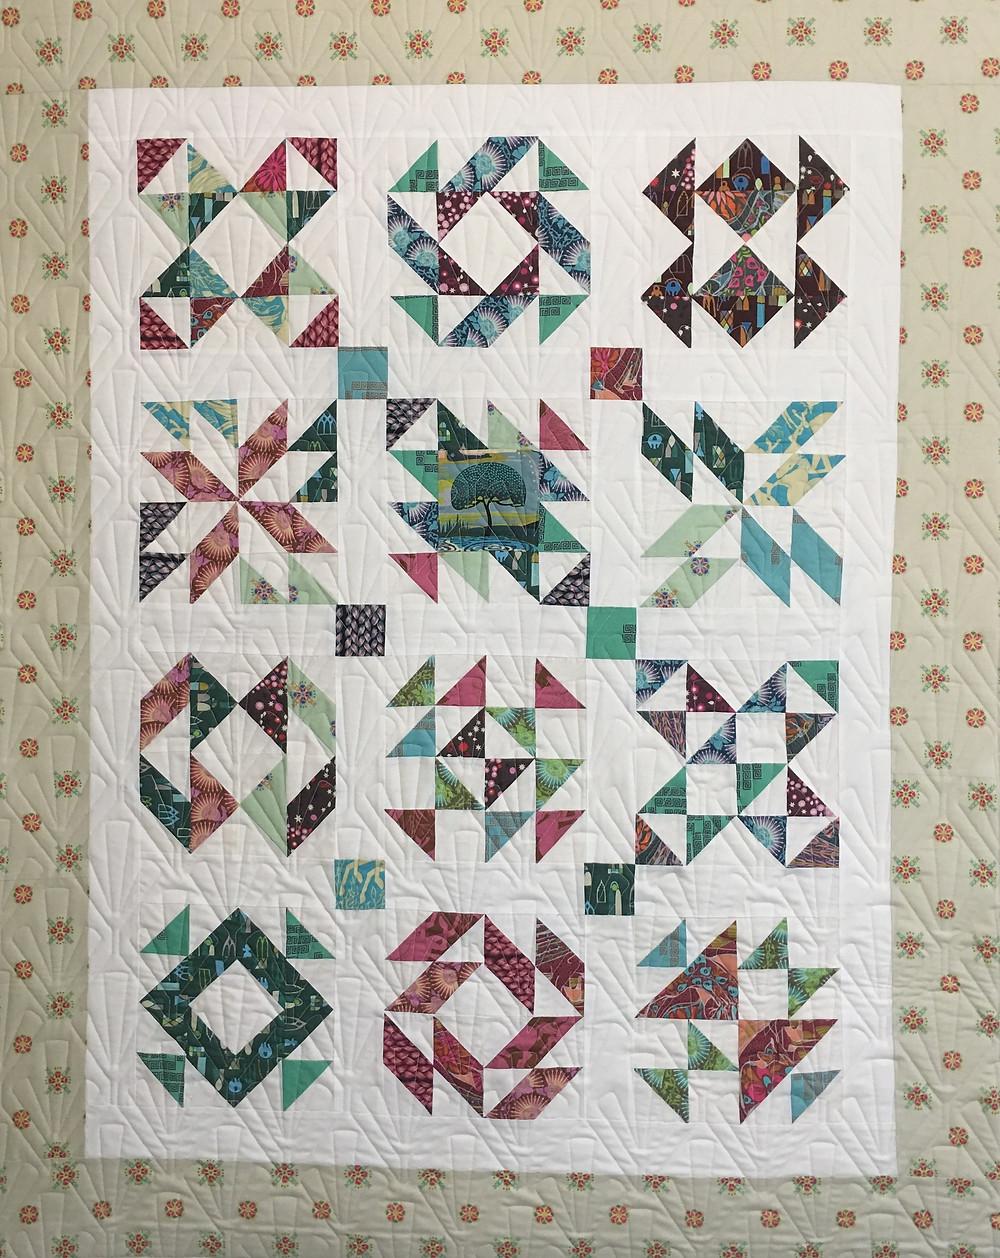 Sew Sampler by Sarah Price